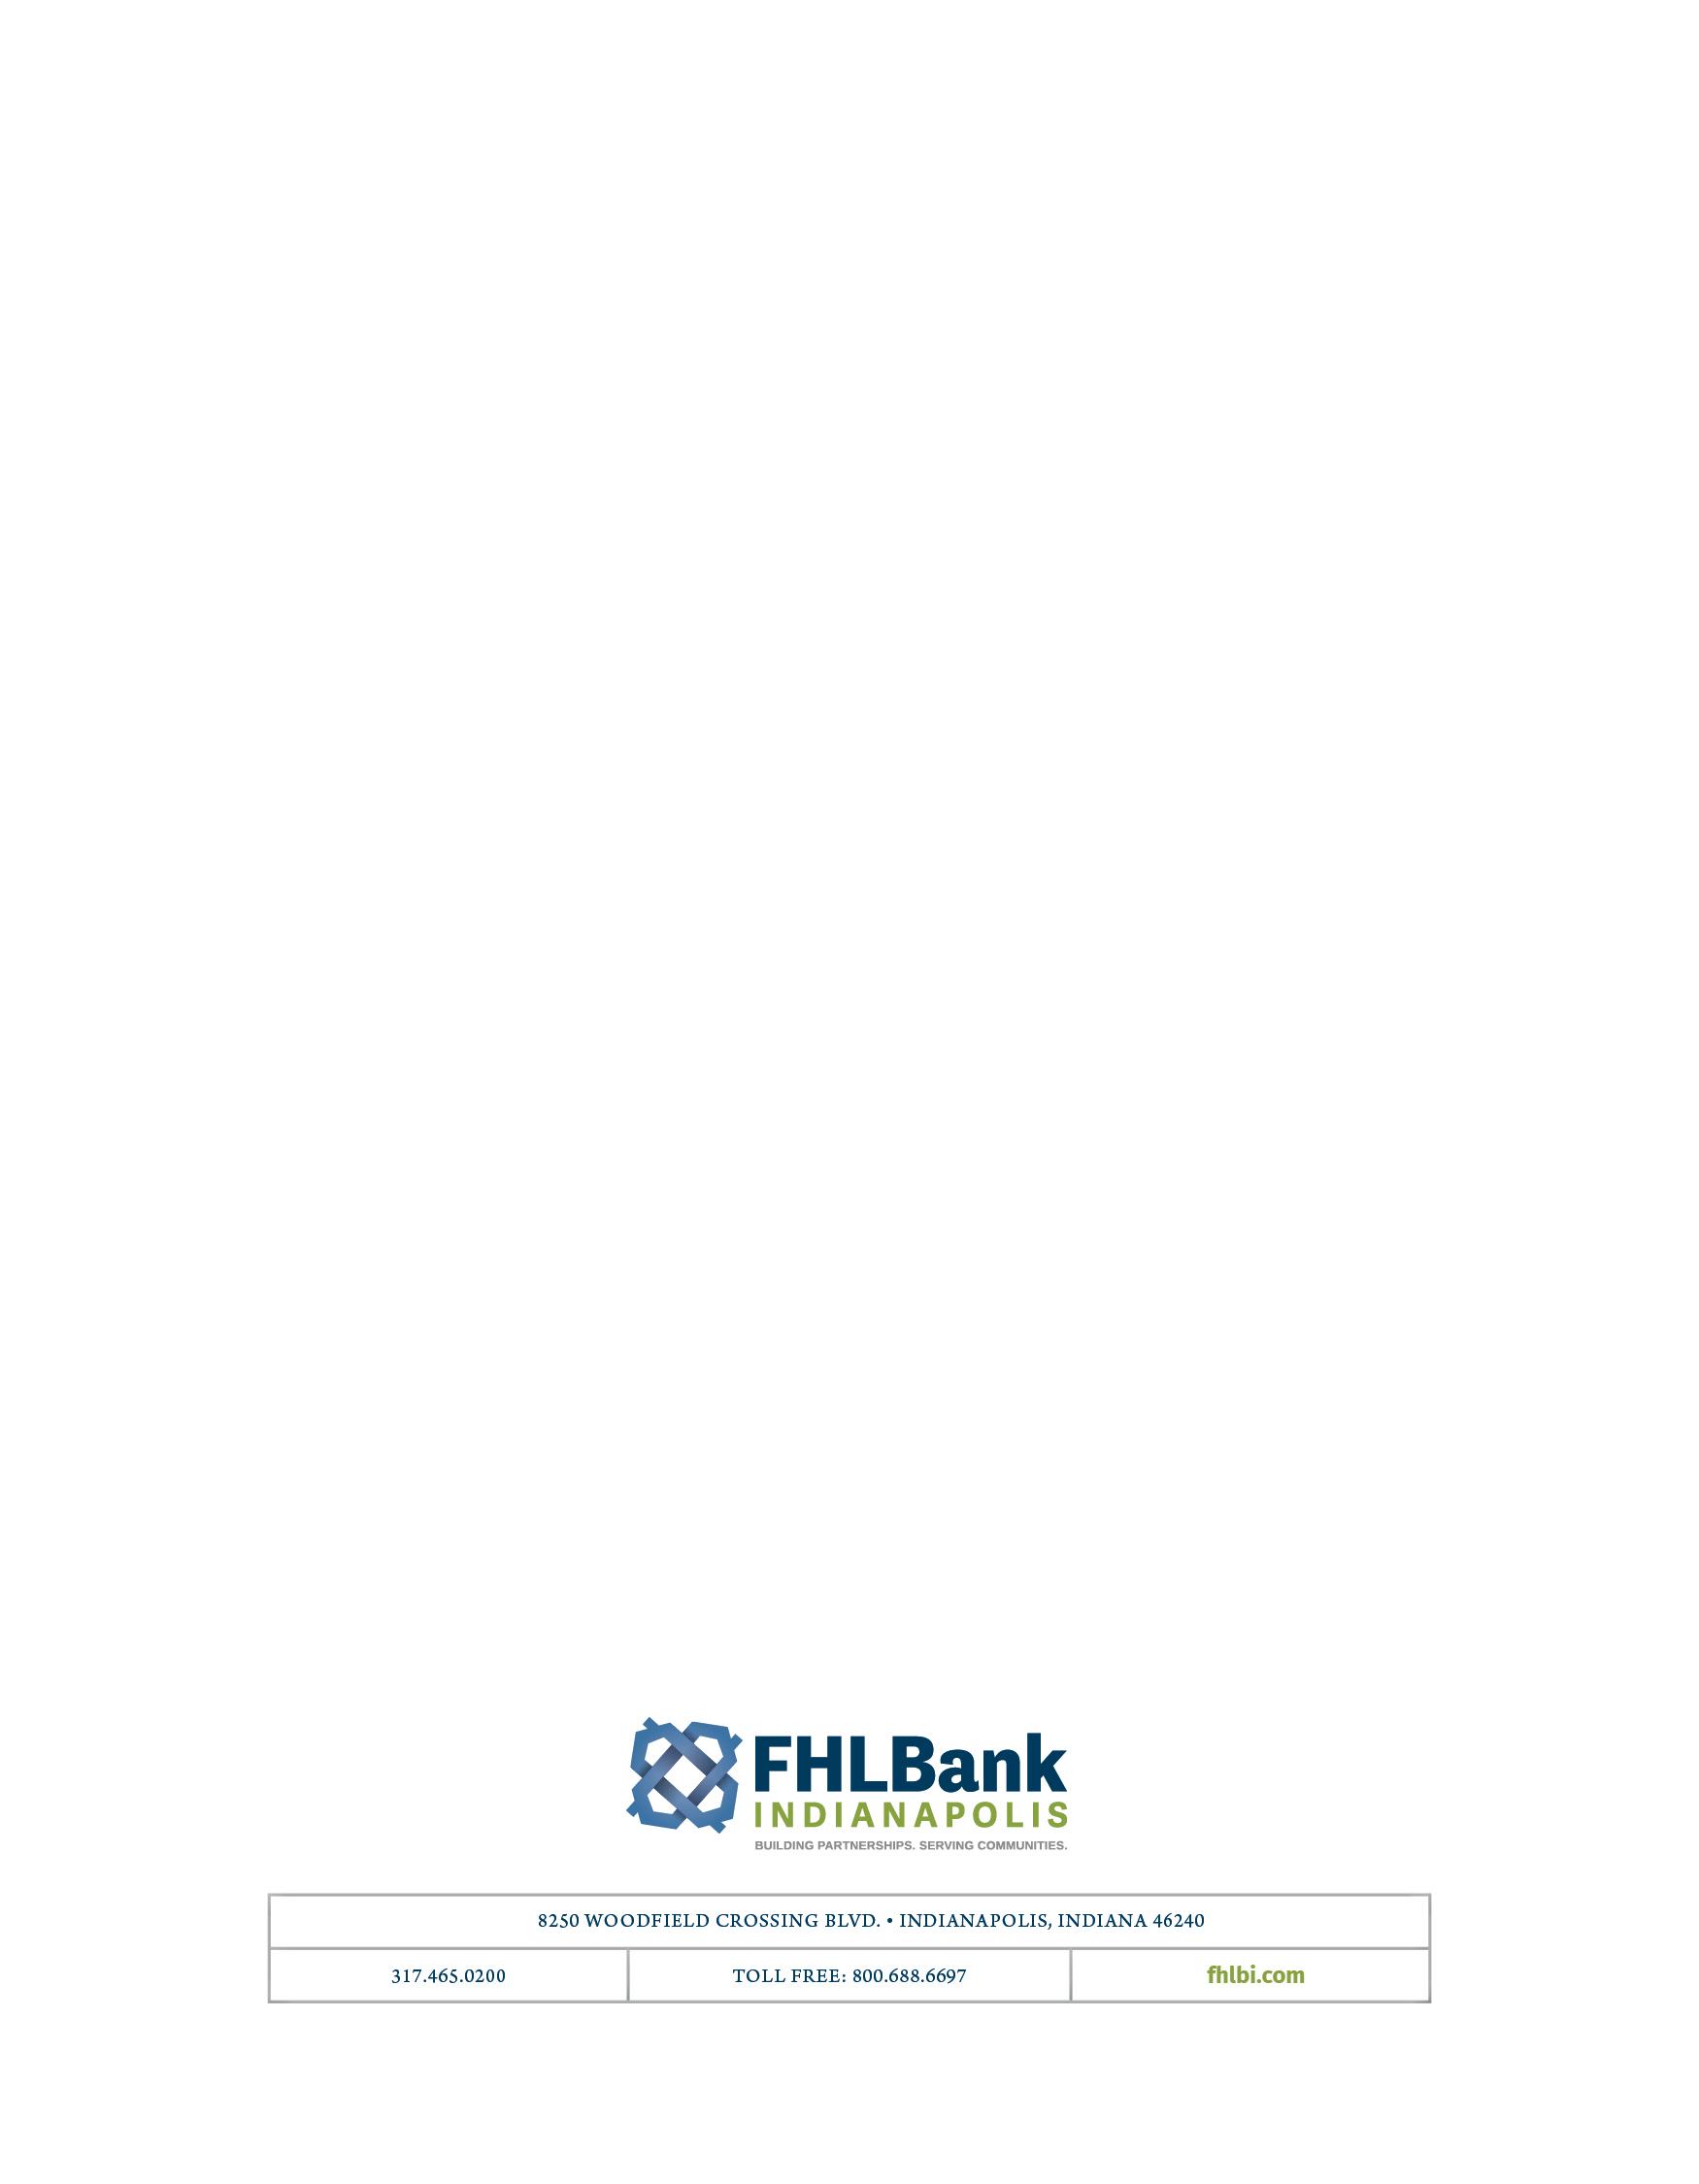 FHLBI_2019_2018CorporateResponsibilityReport_V1613.jpg